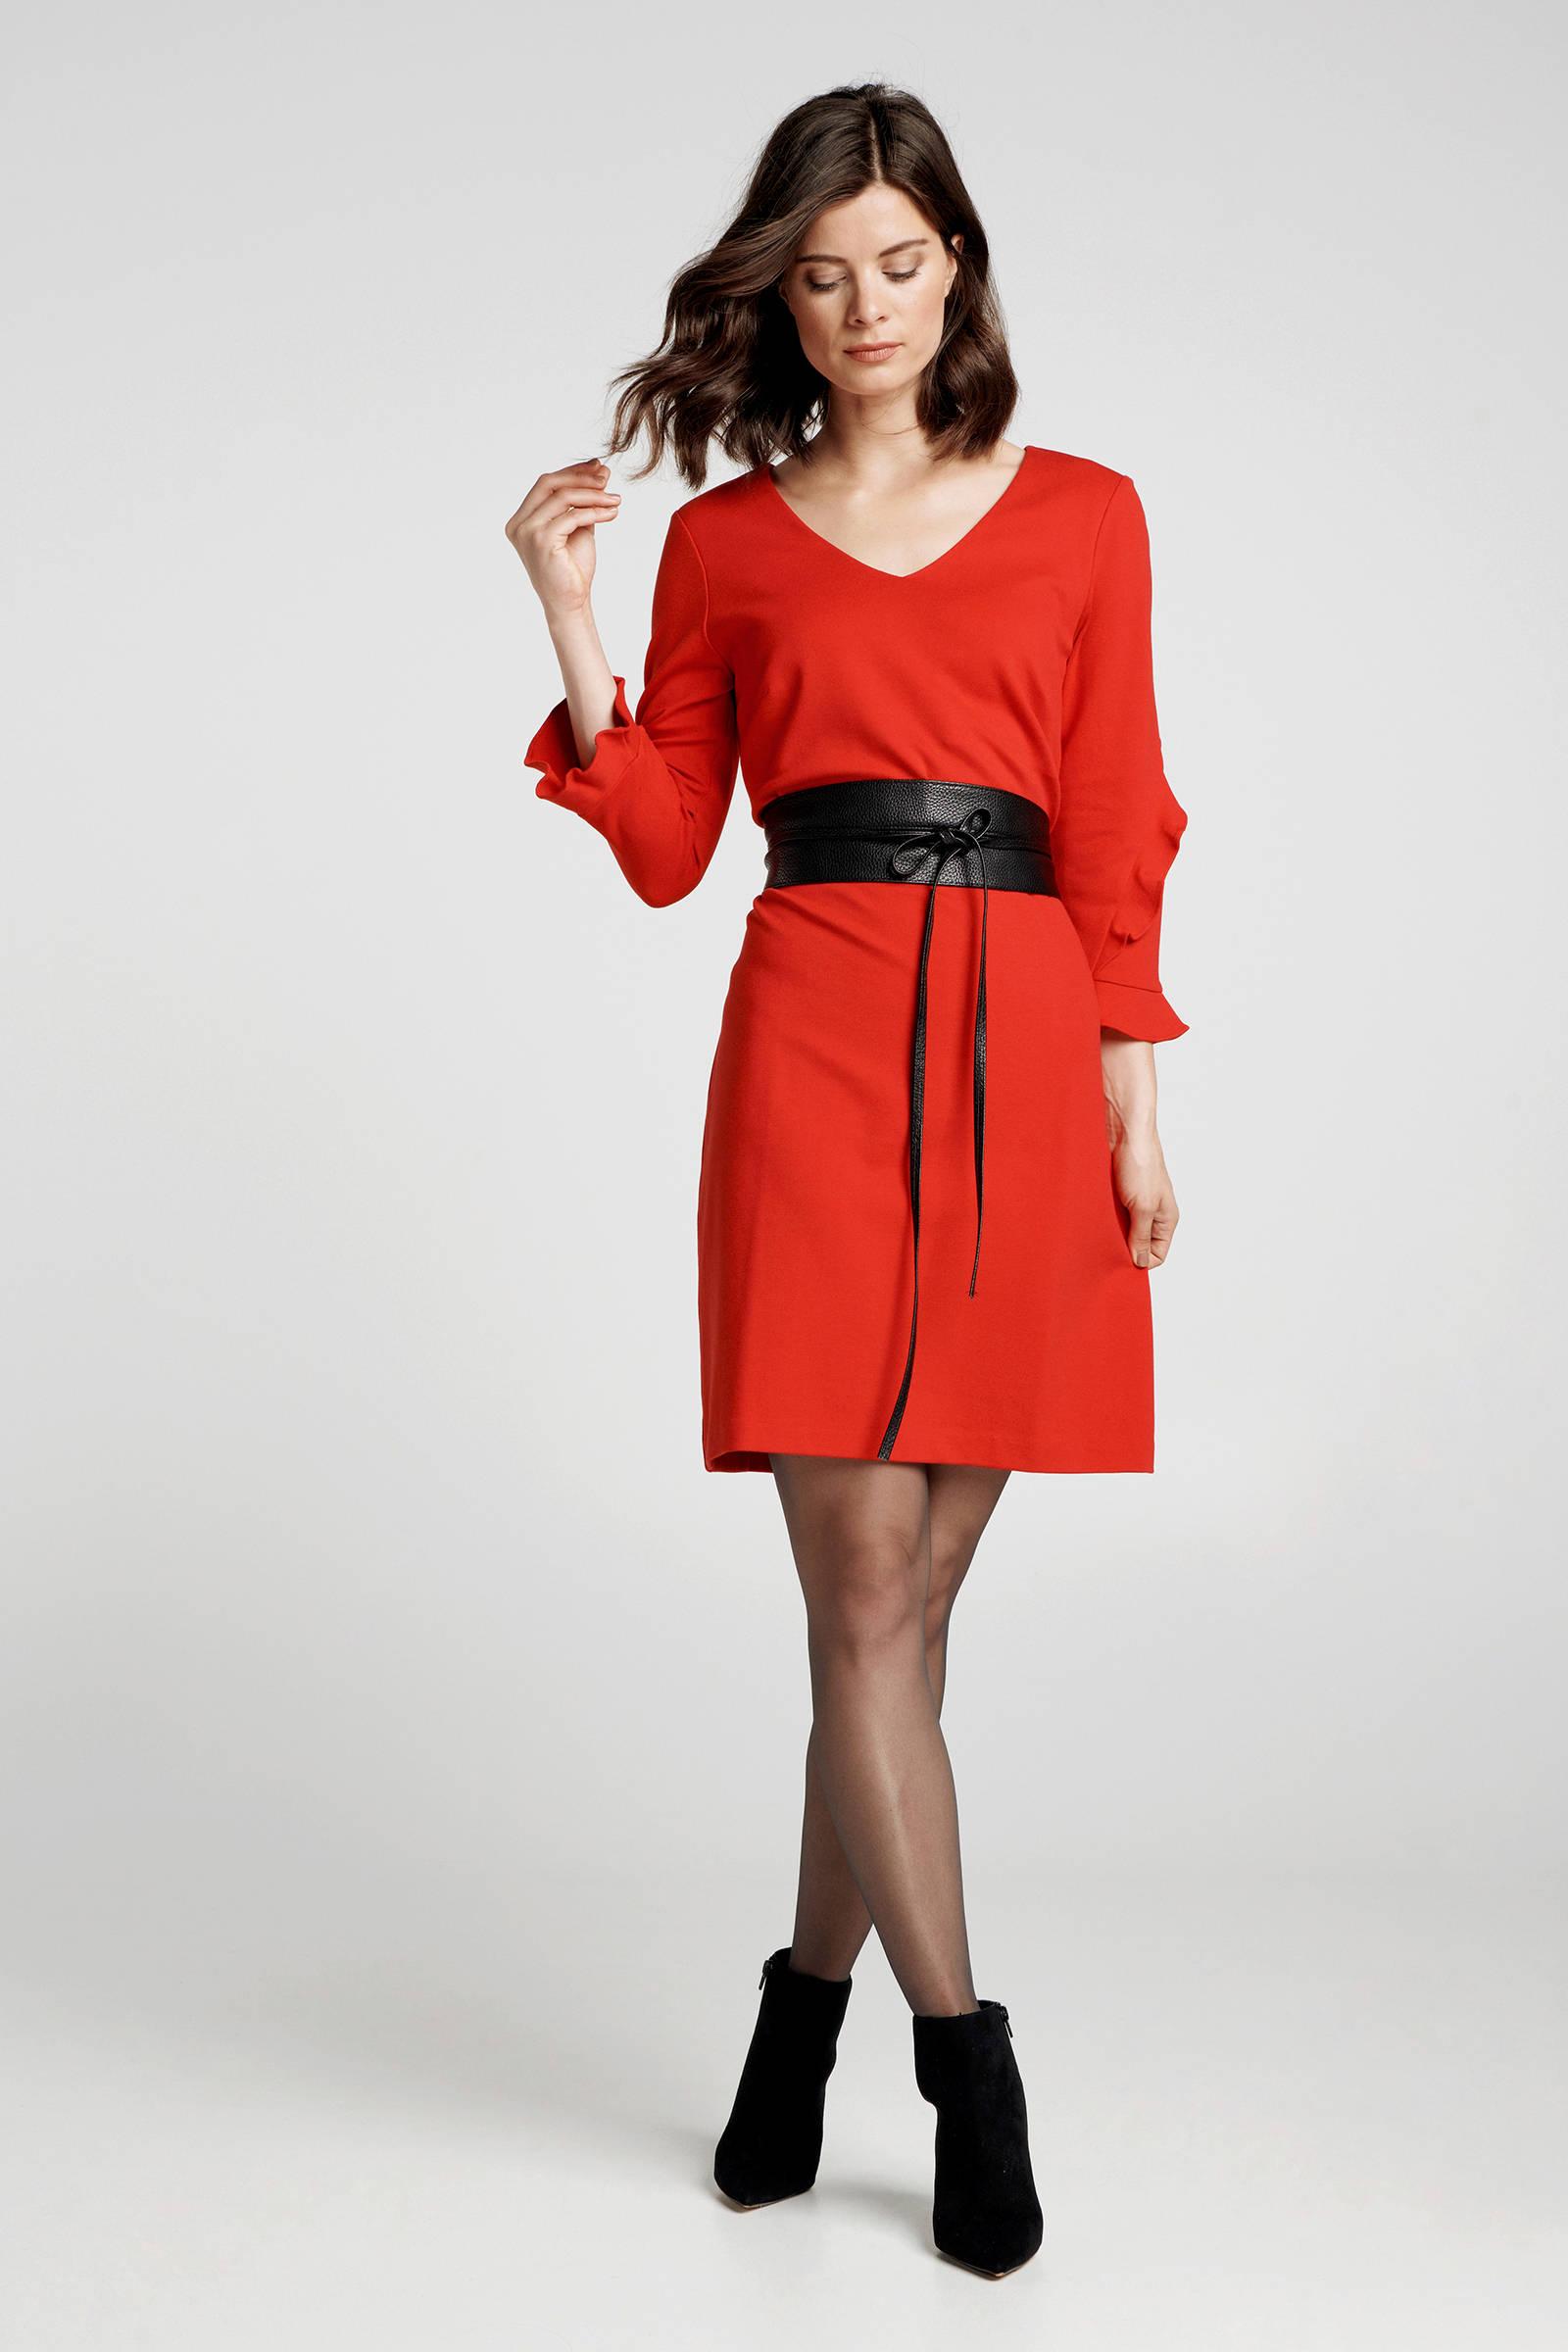 Steps rood jurk jurk rood Steps rood Steps jurk Steps jurk jurk rood Steps rHqwtBr